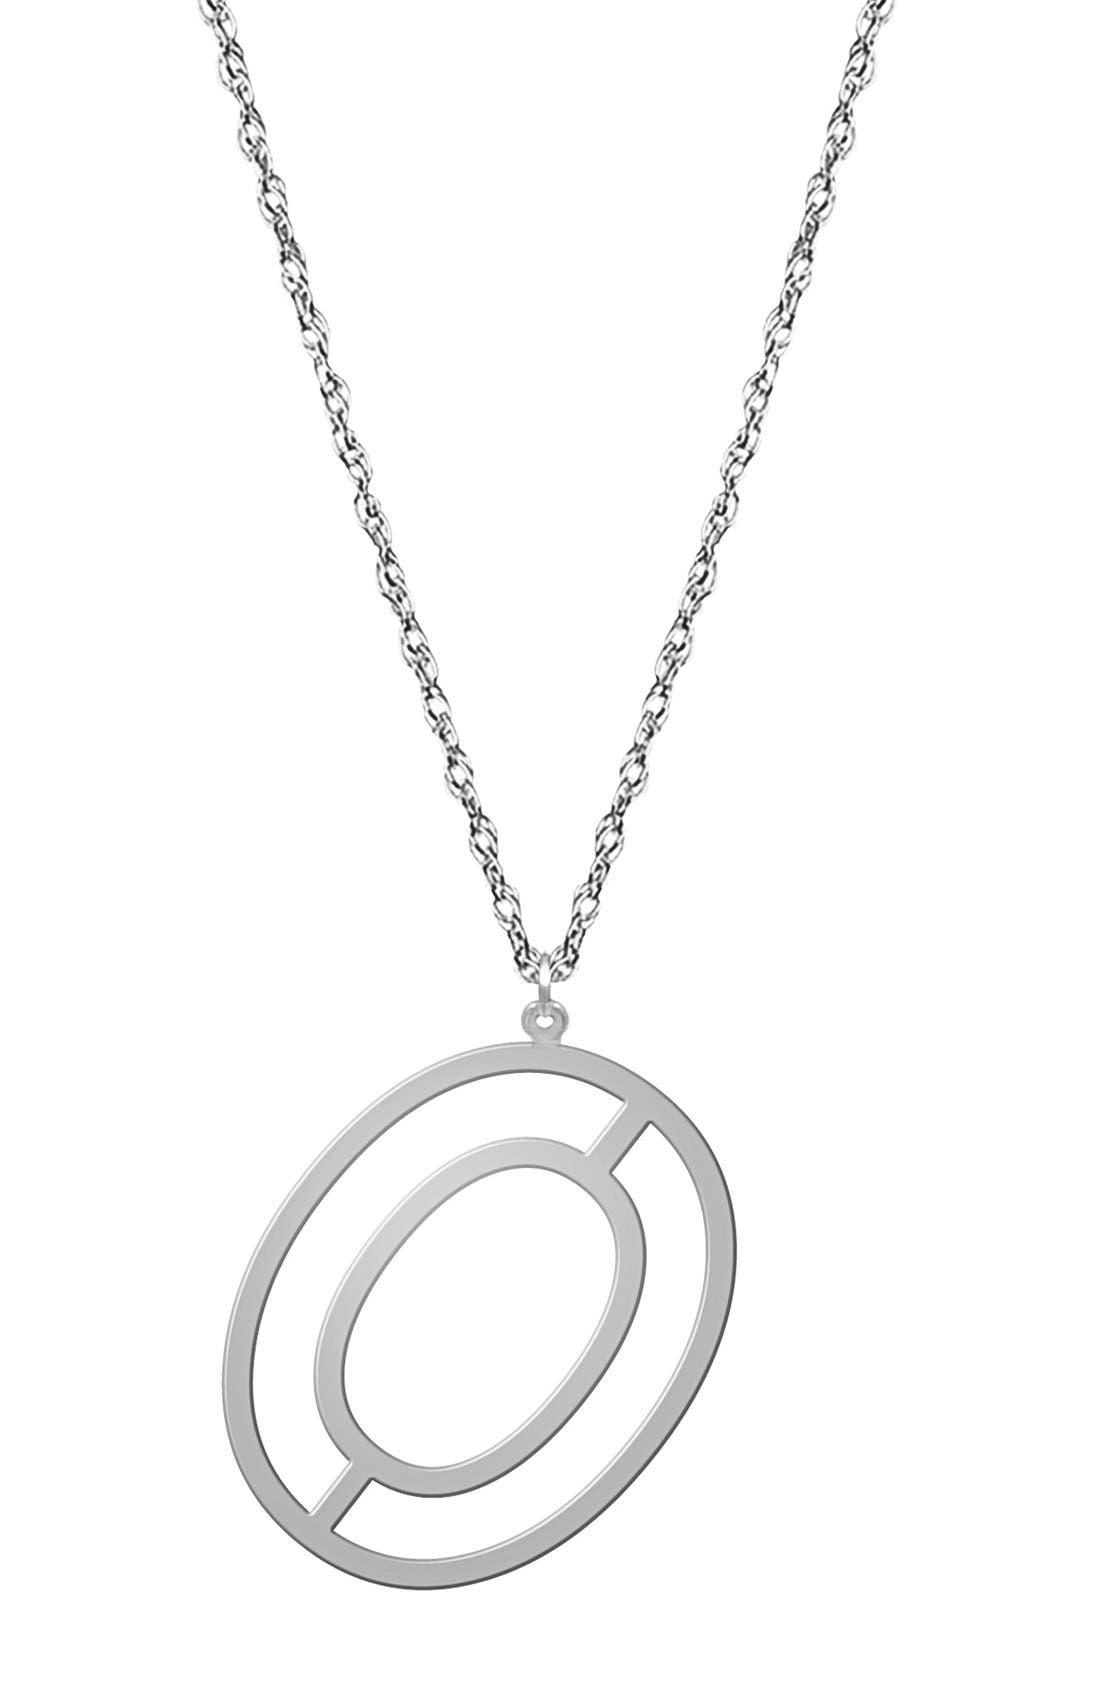 Varsity Initial Pendant Necklace